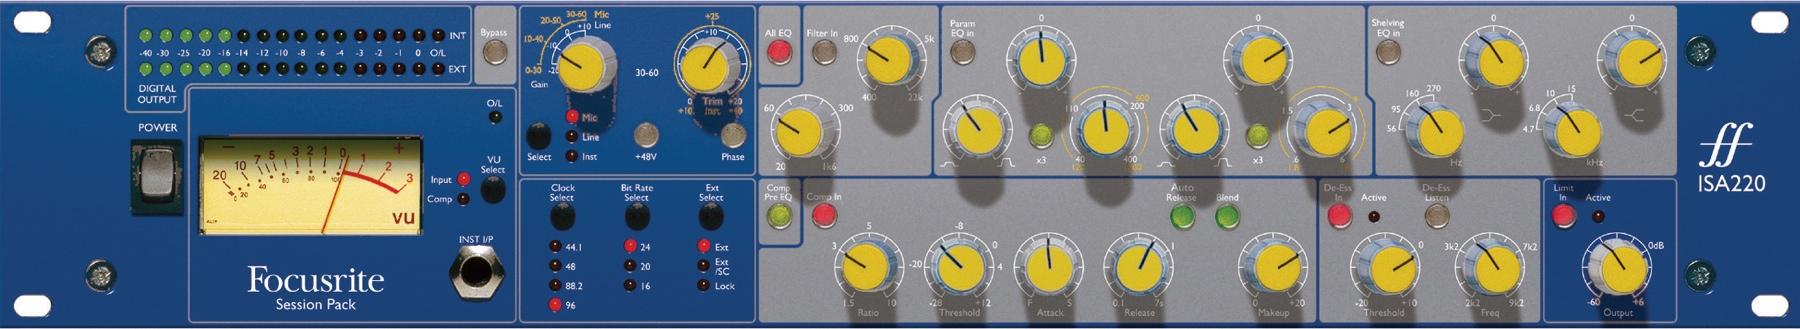 ISA220-Mixwerk